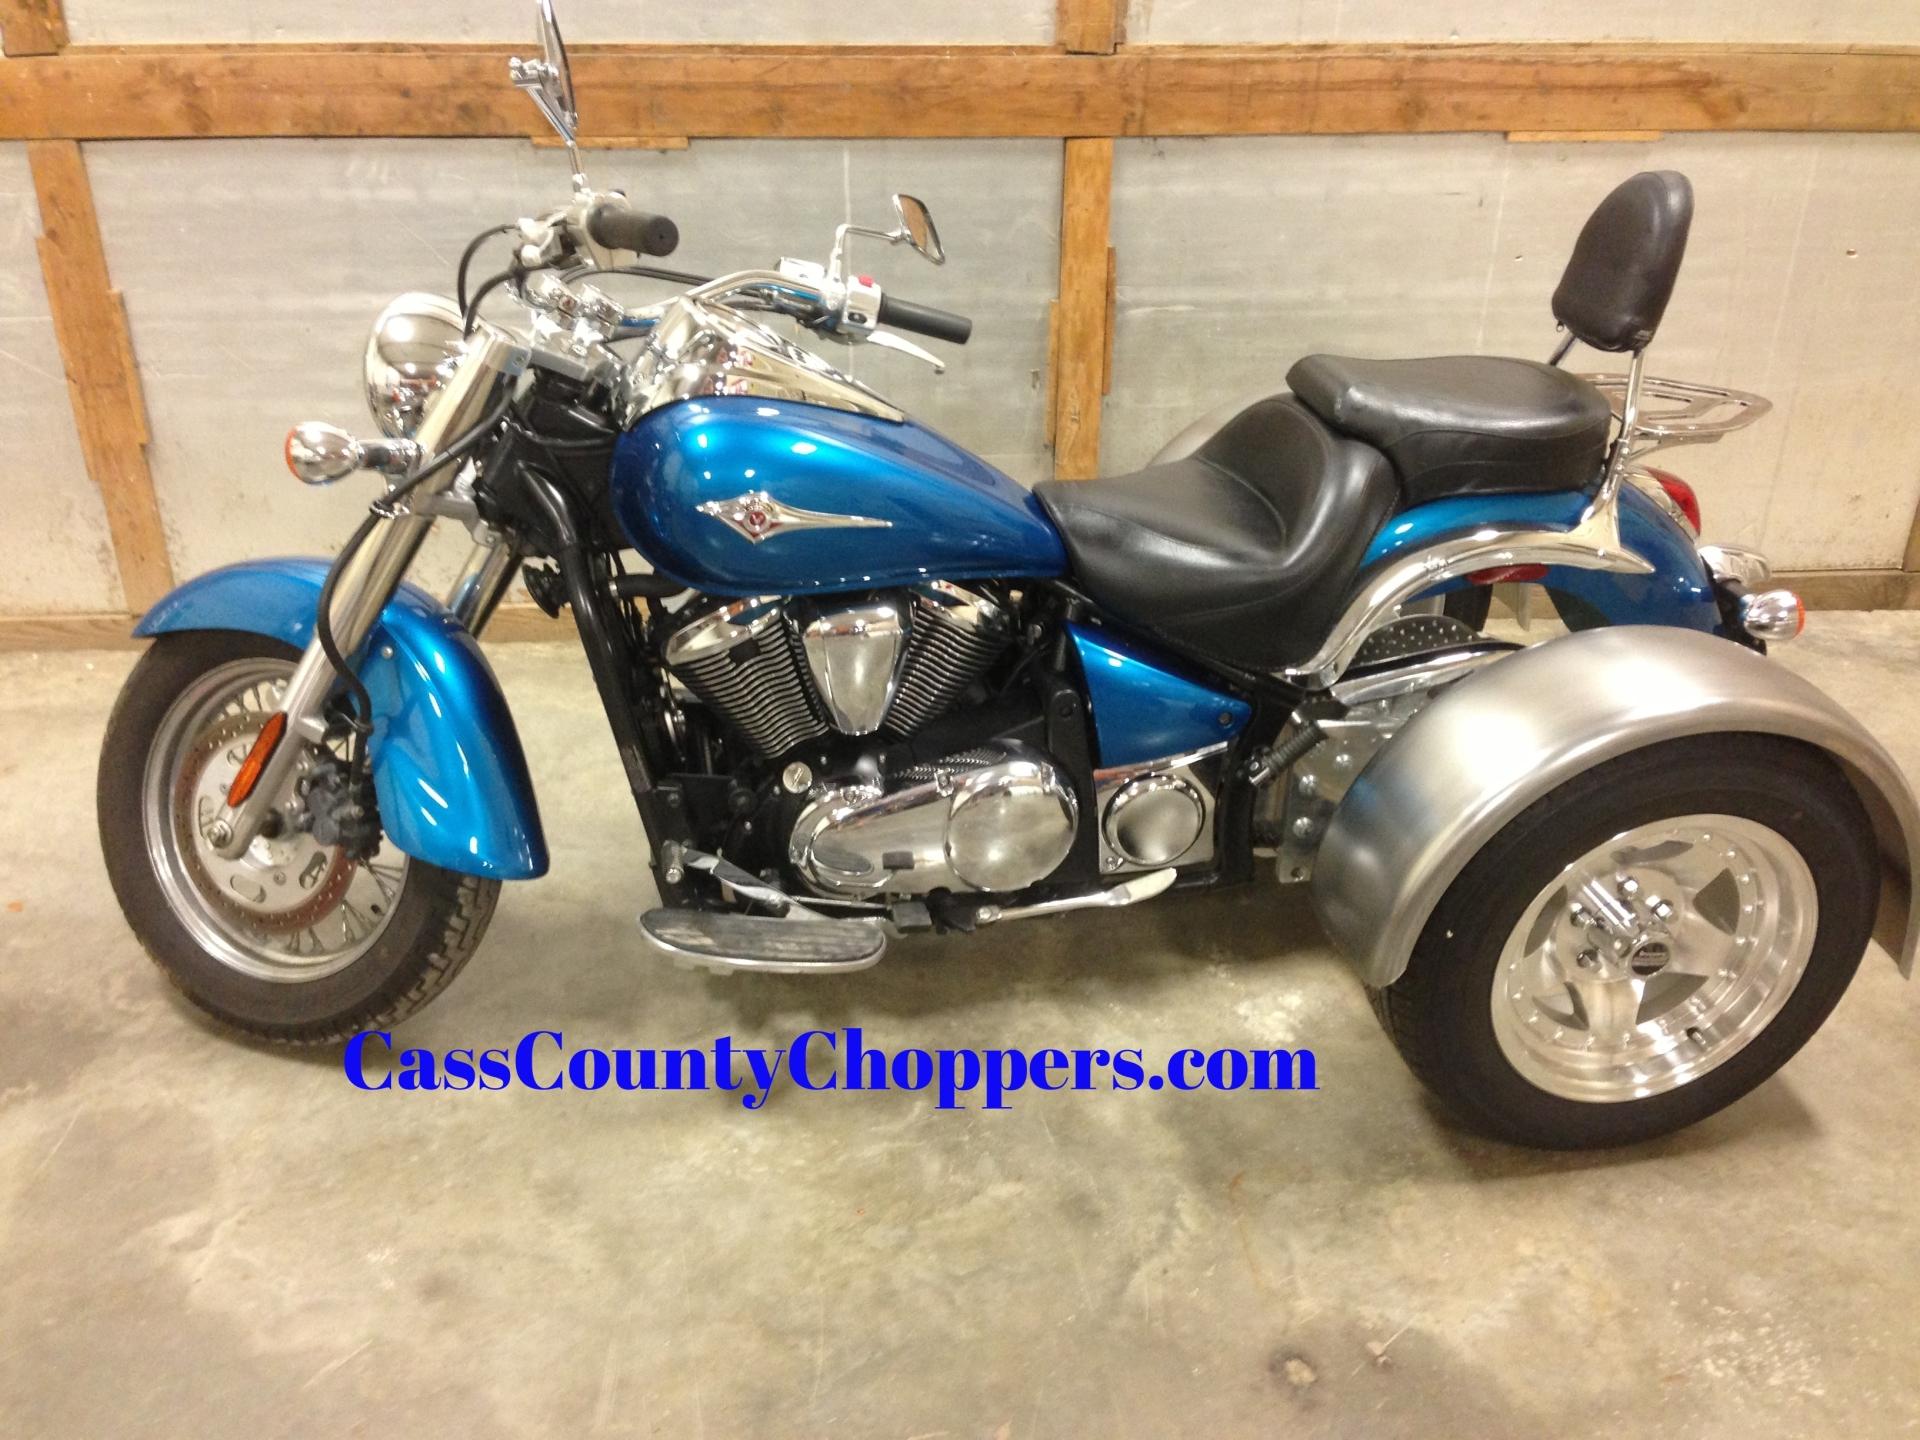 Light blue Kawasaki Vulcan 900 motorcycle converted to trike with conversion kit.